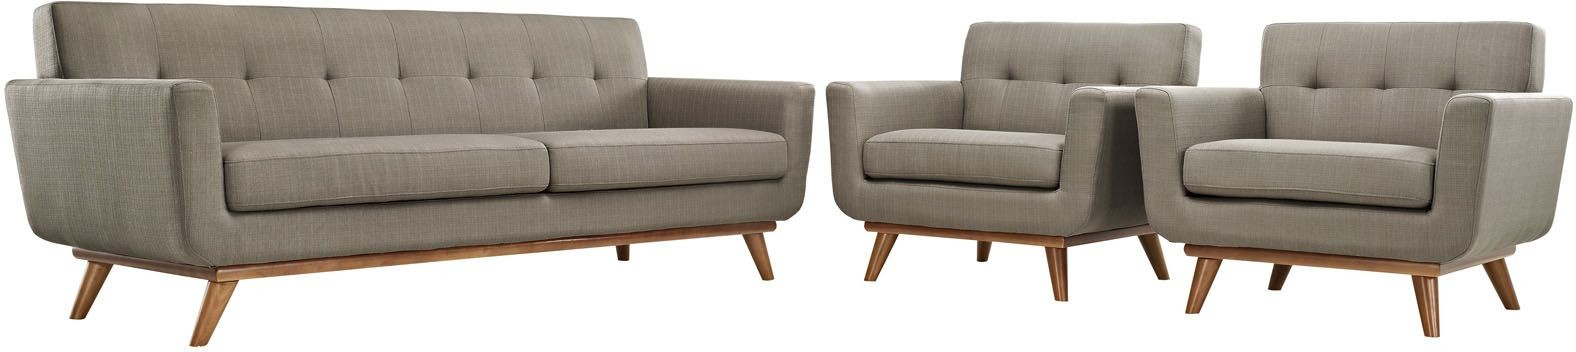 Engage Granite Sofa with 2 Armchairs, EEI-1345-GRA, Renegade Furniture